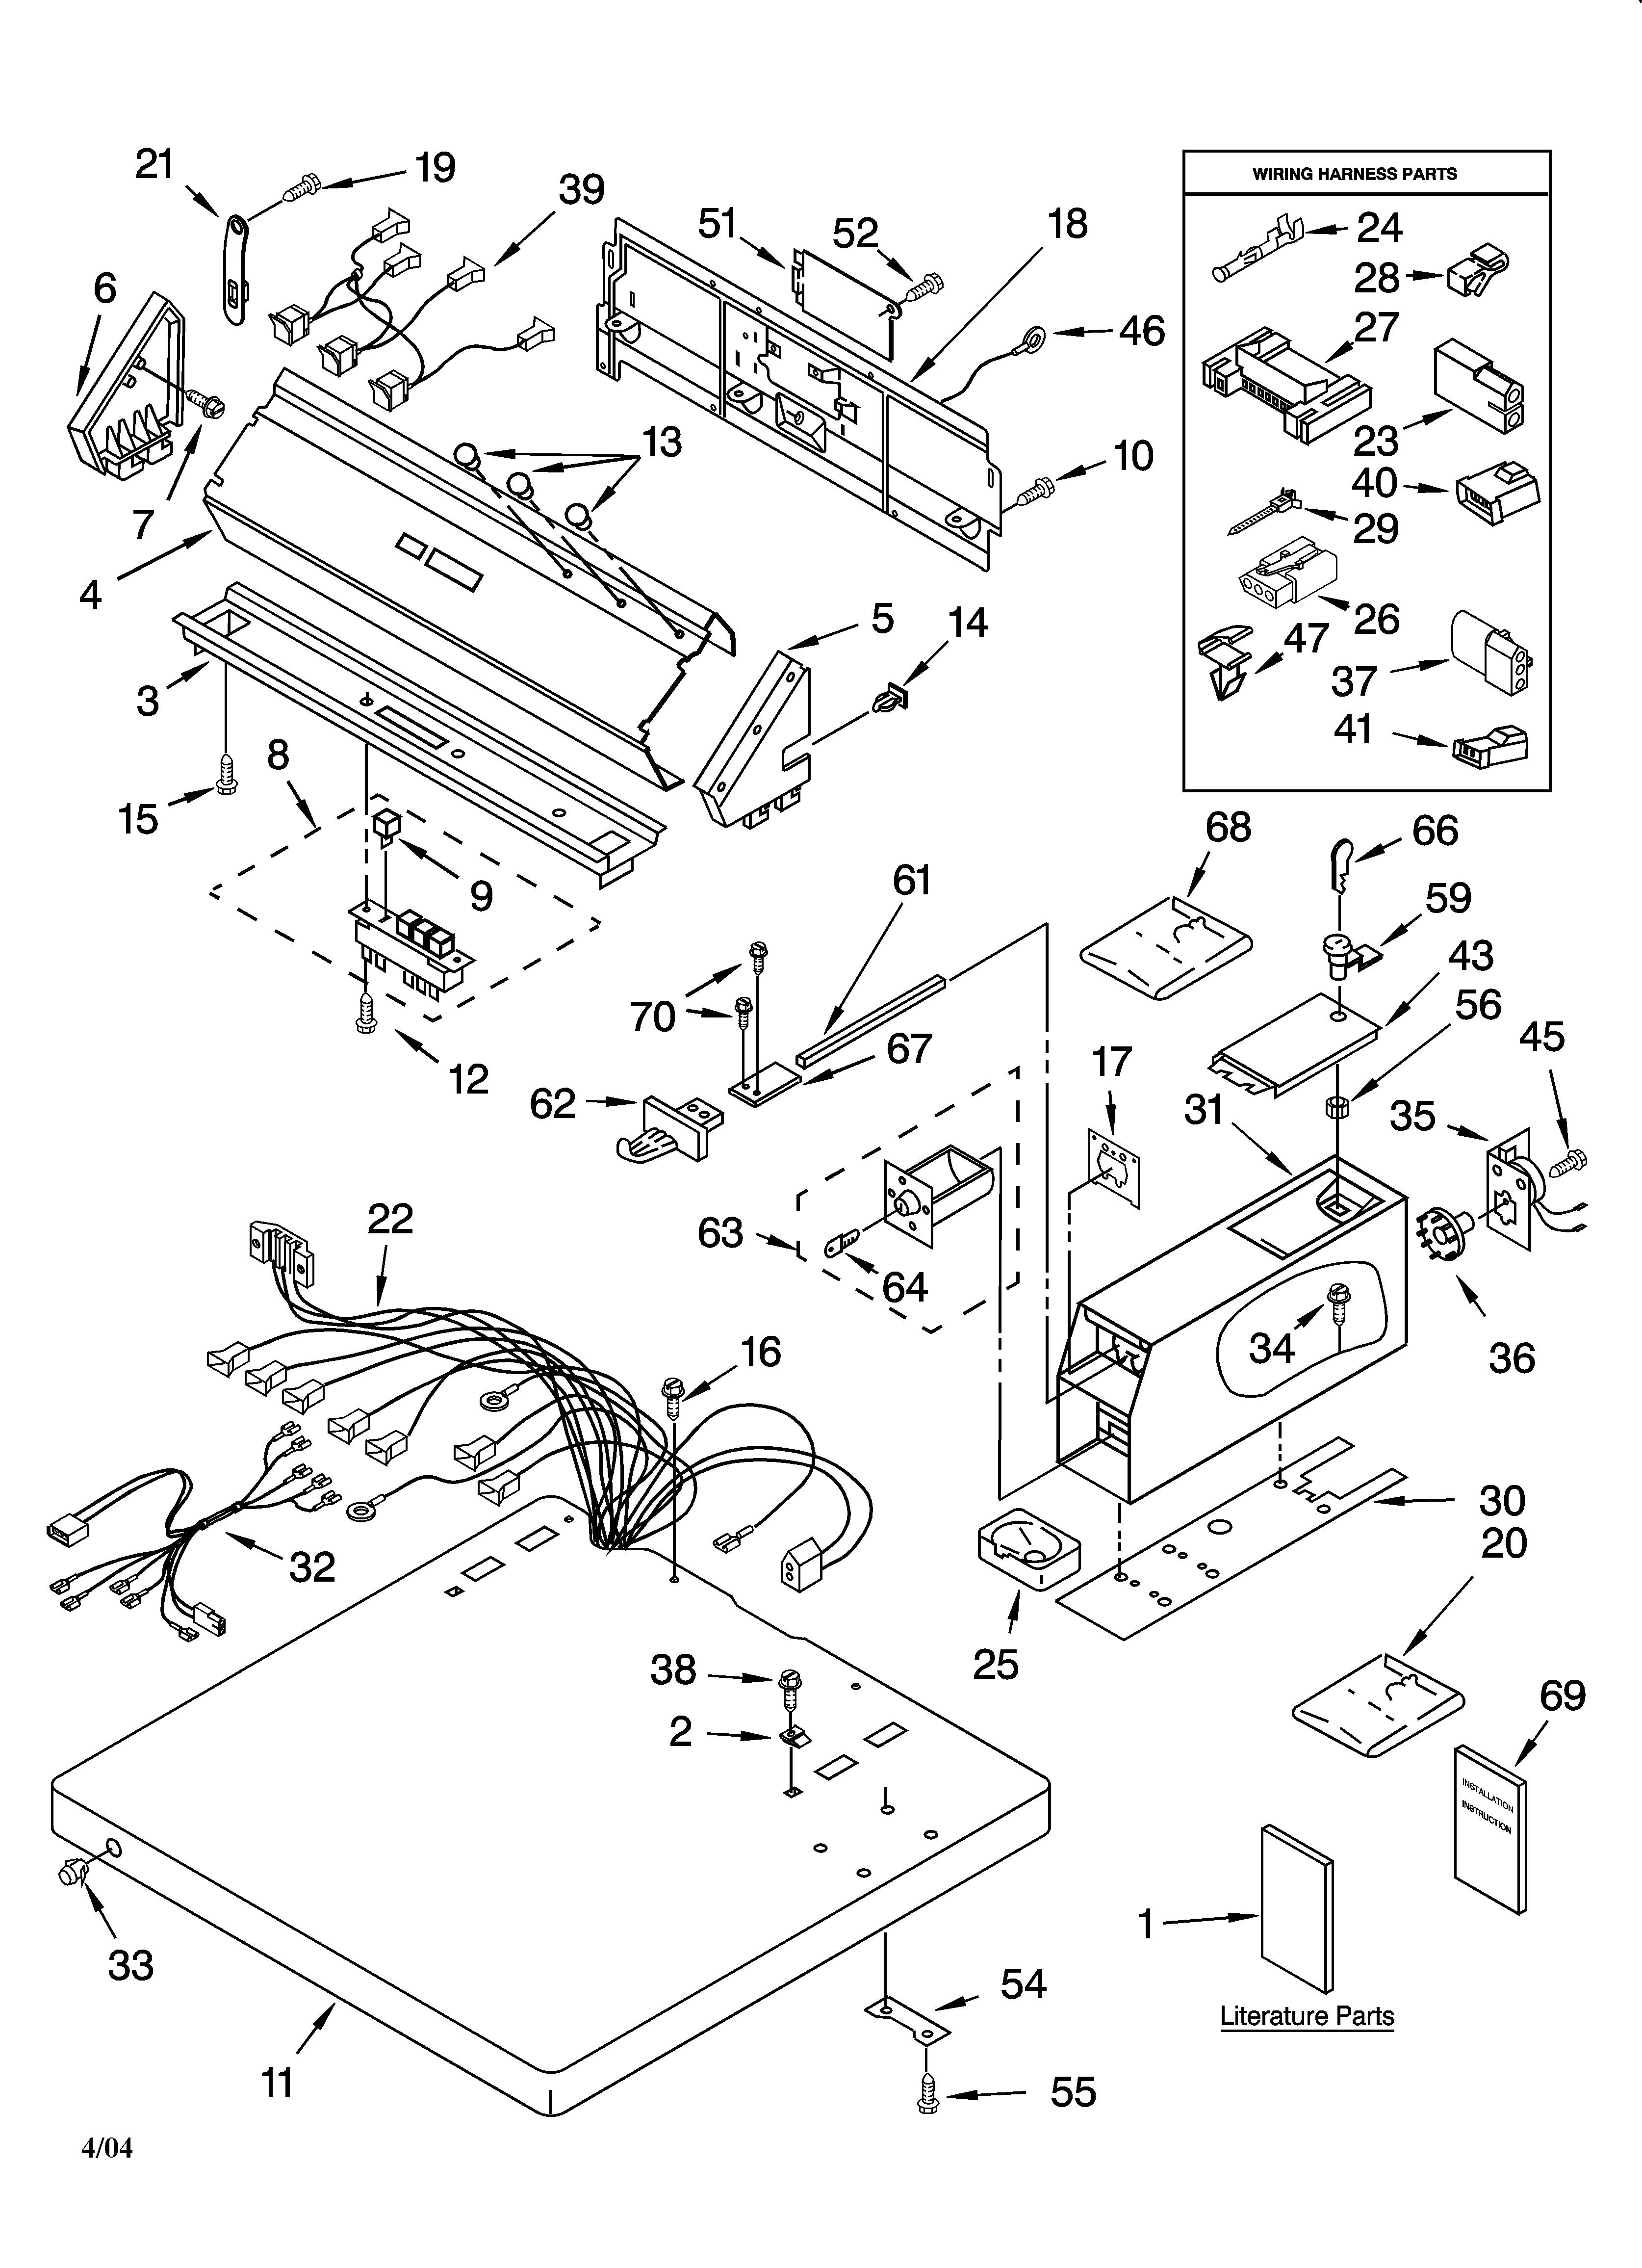 whirlpool dryer troubleshooting